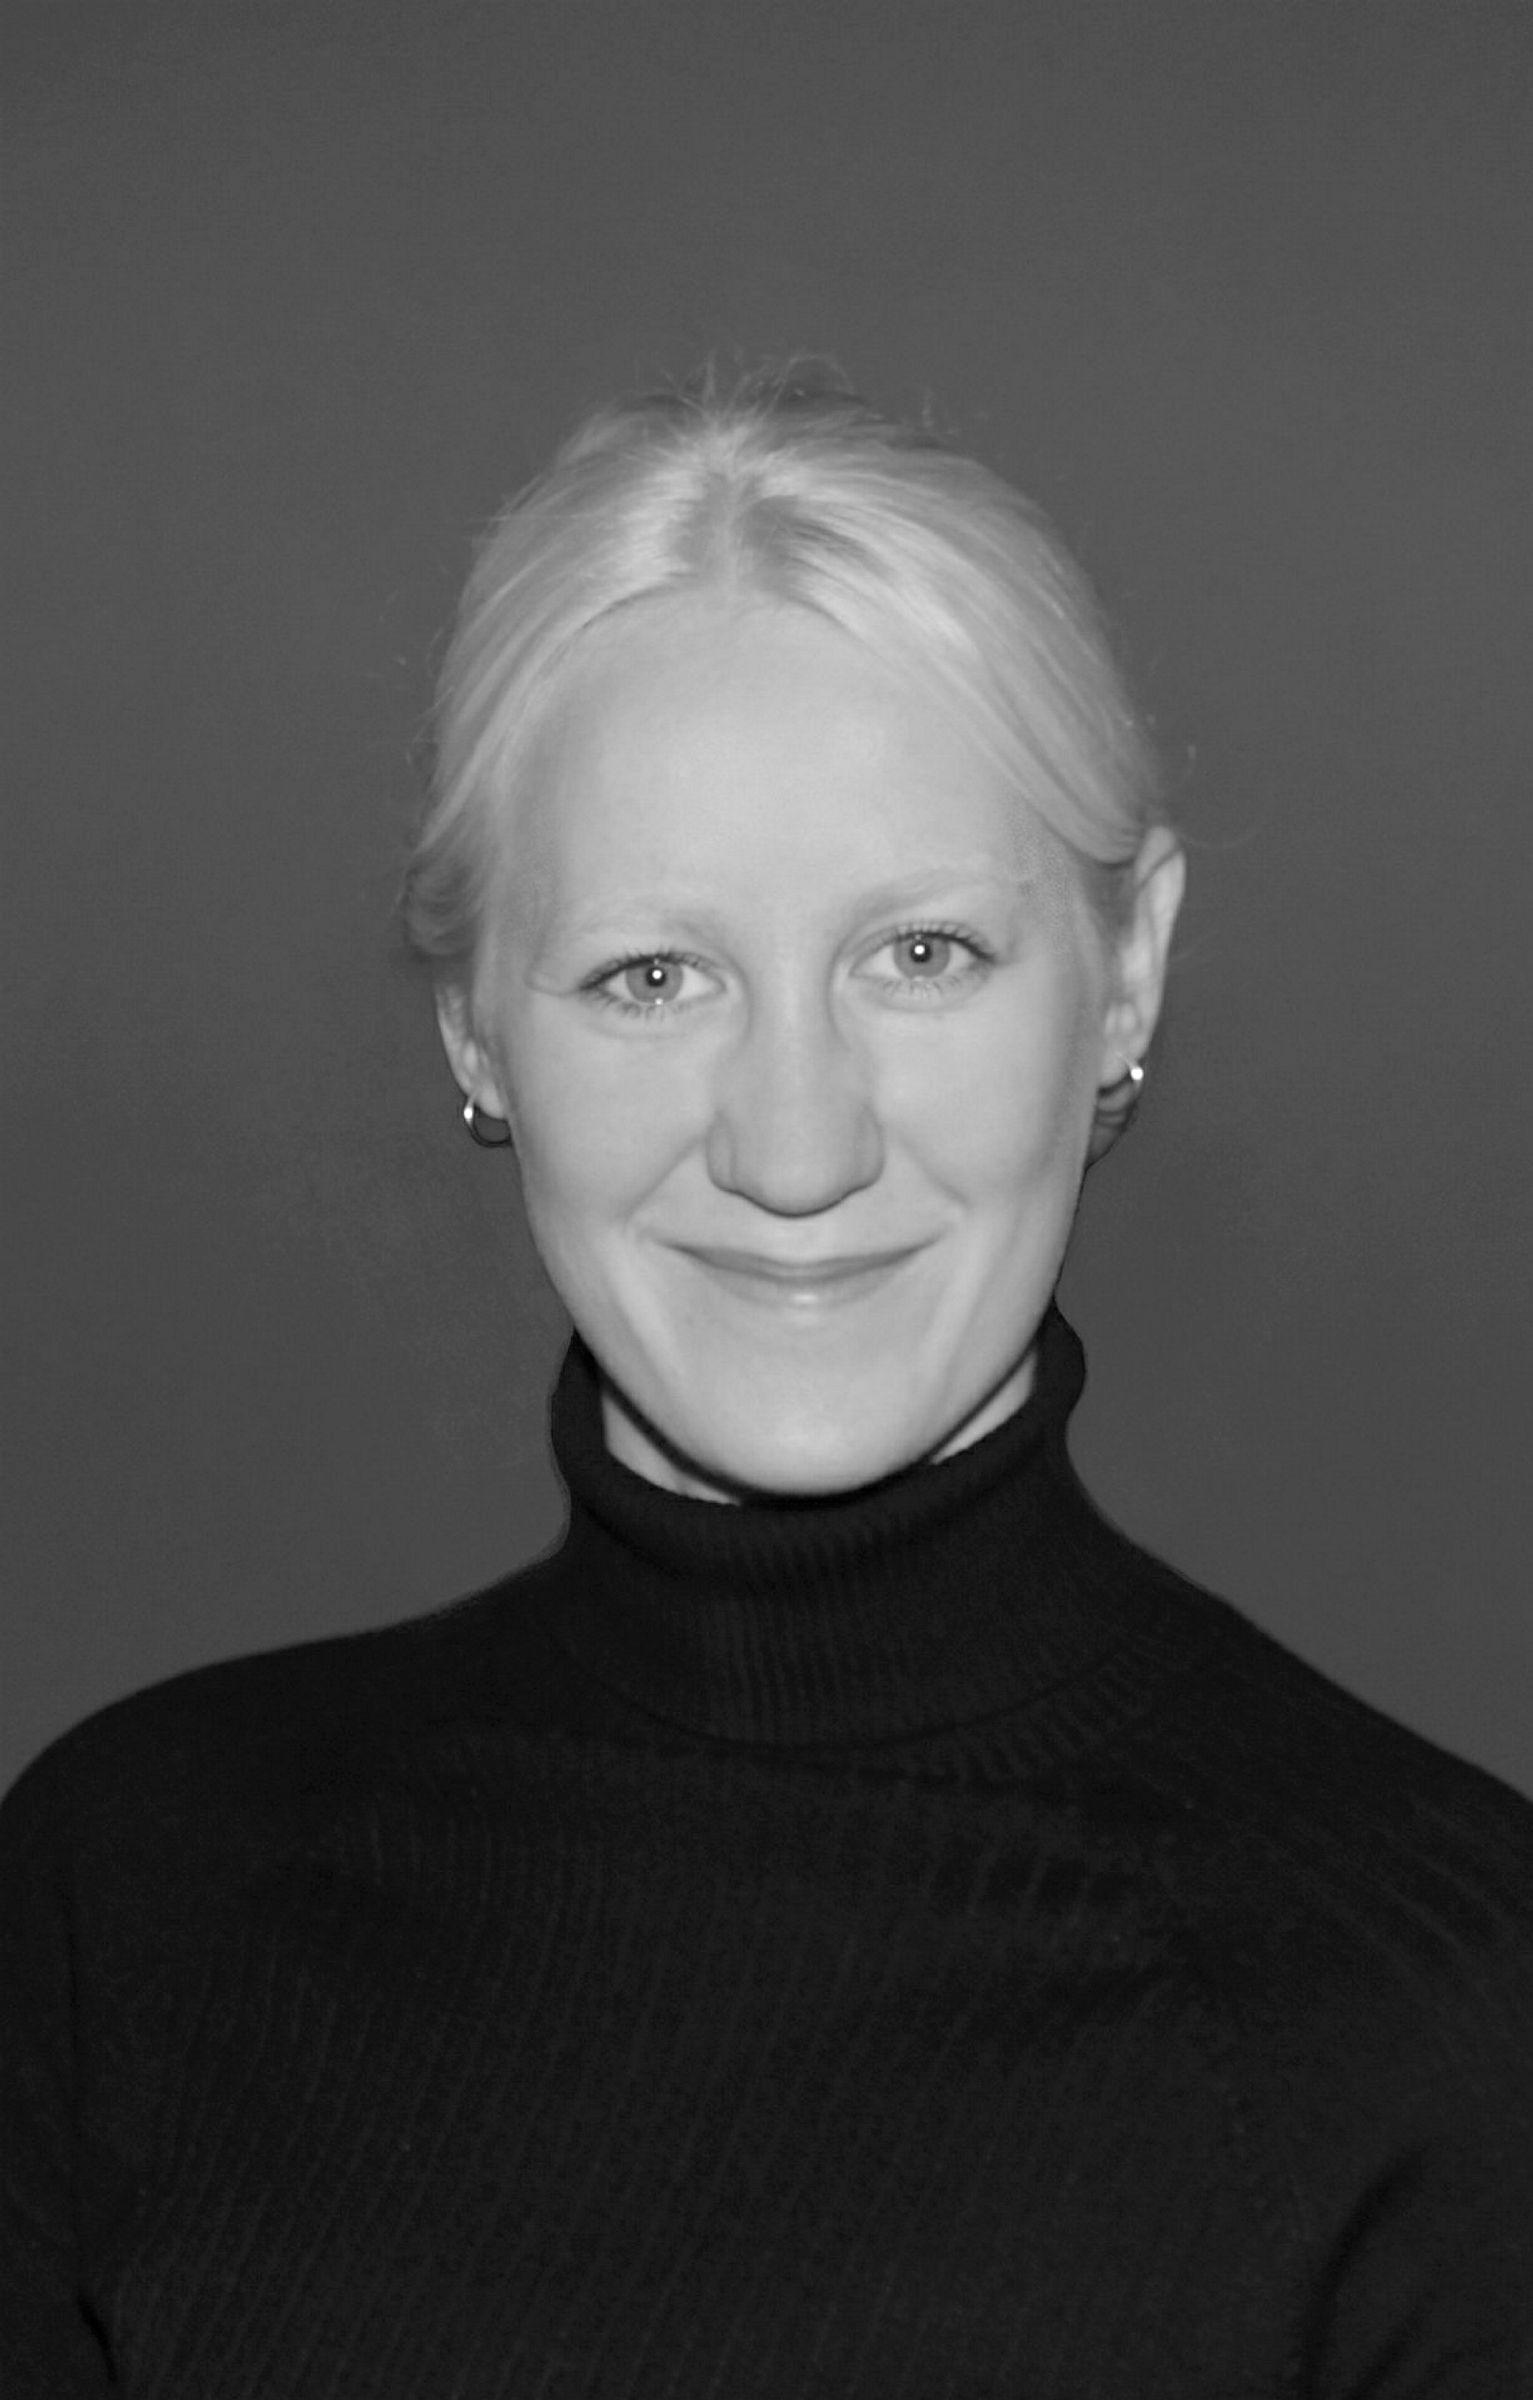 Hannah Løke Kjos